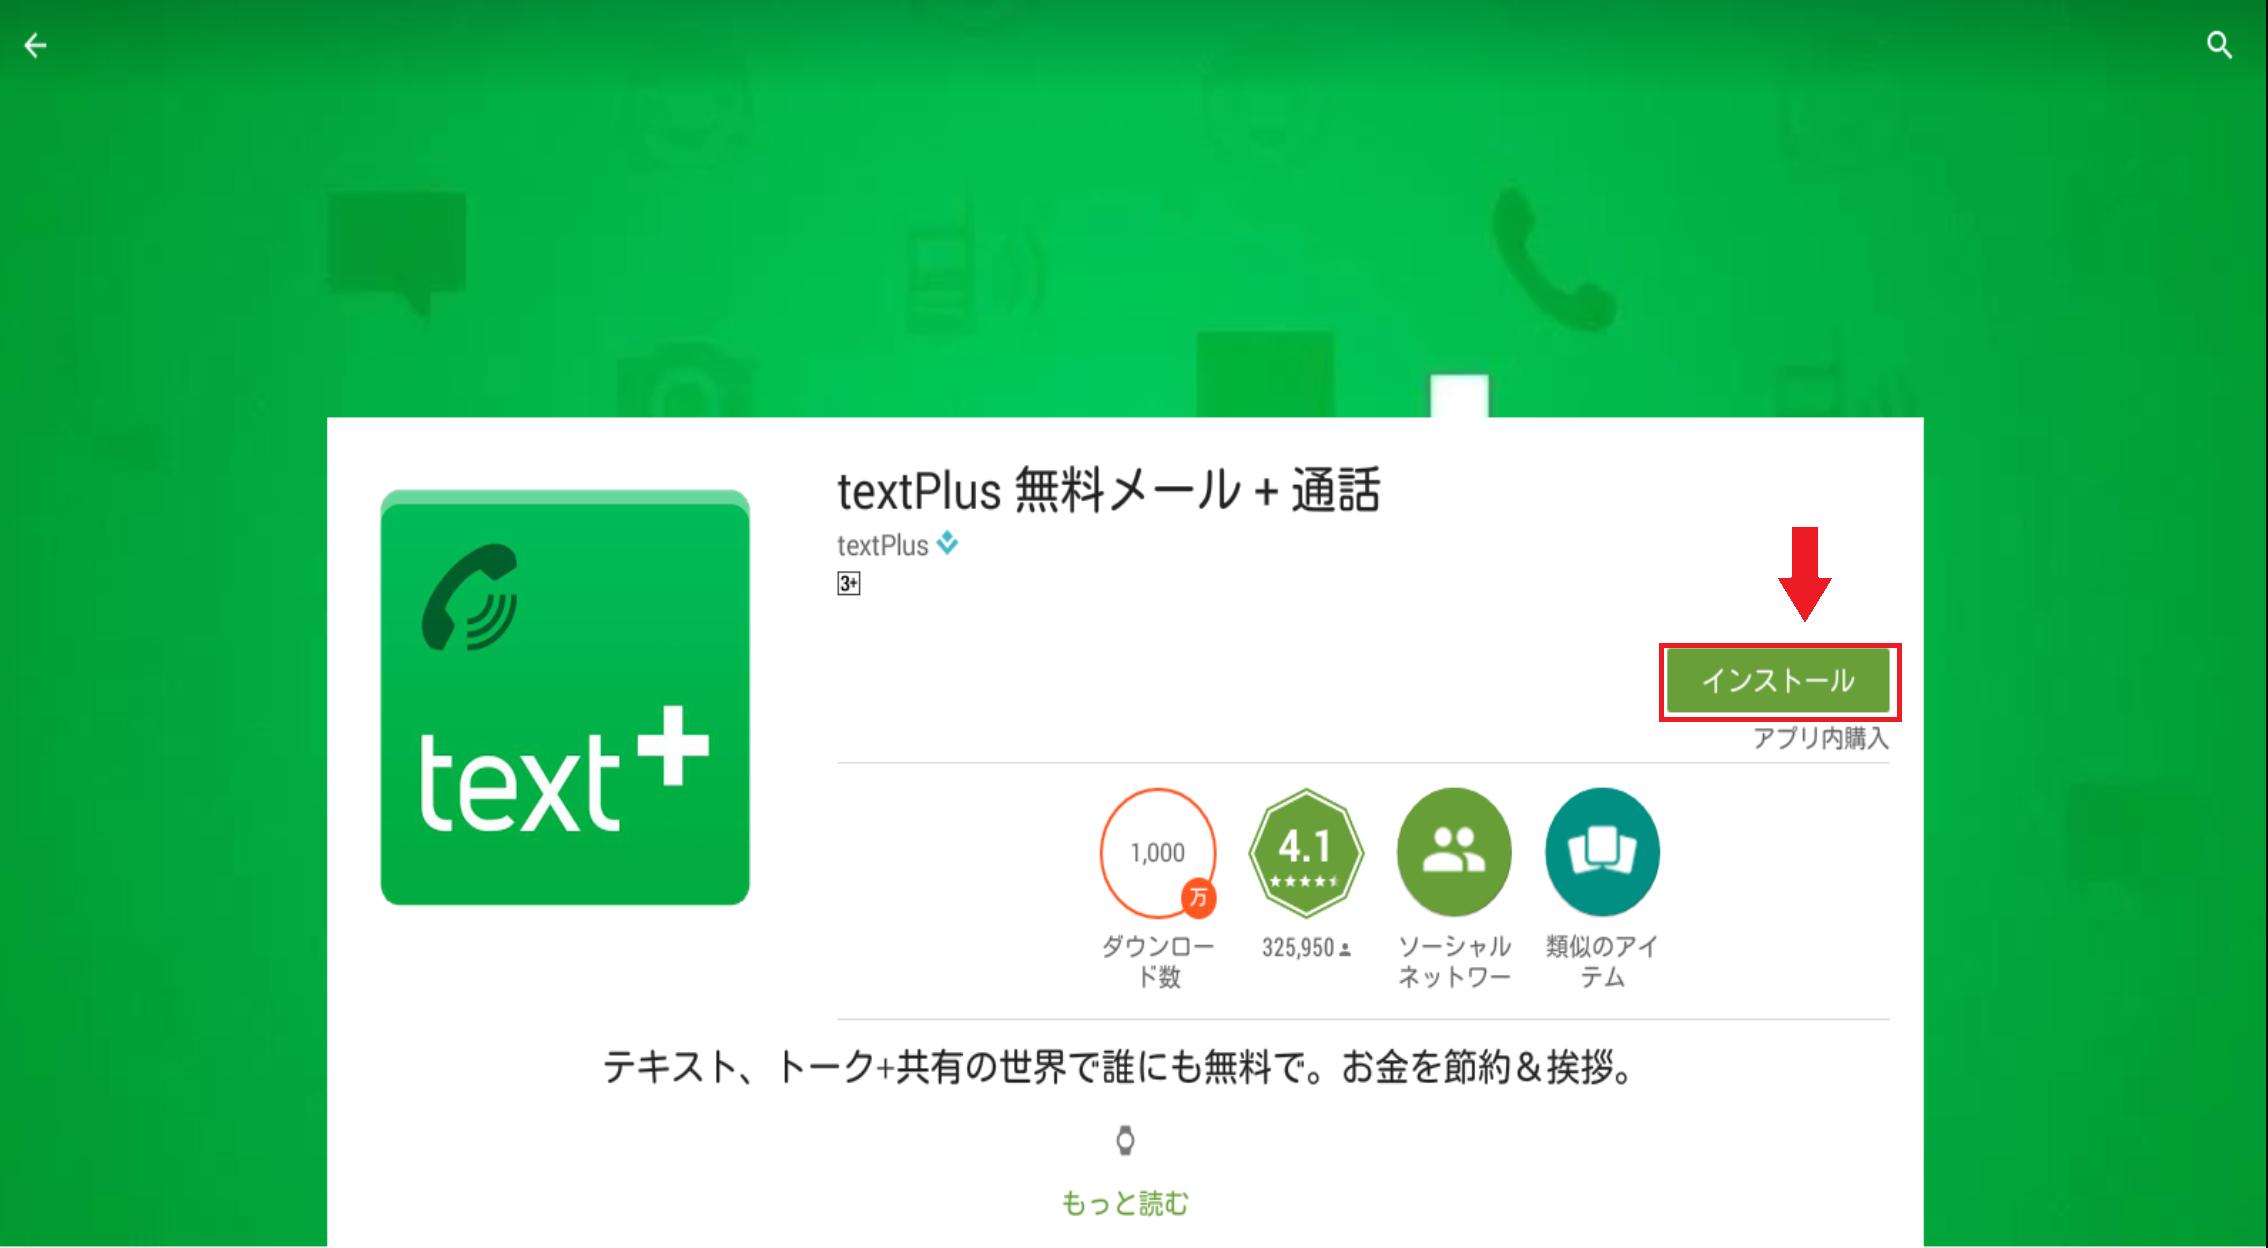 textplus1